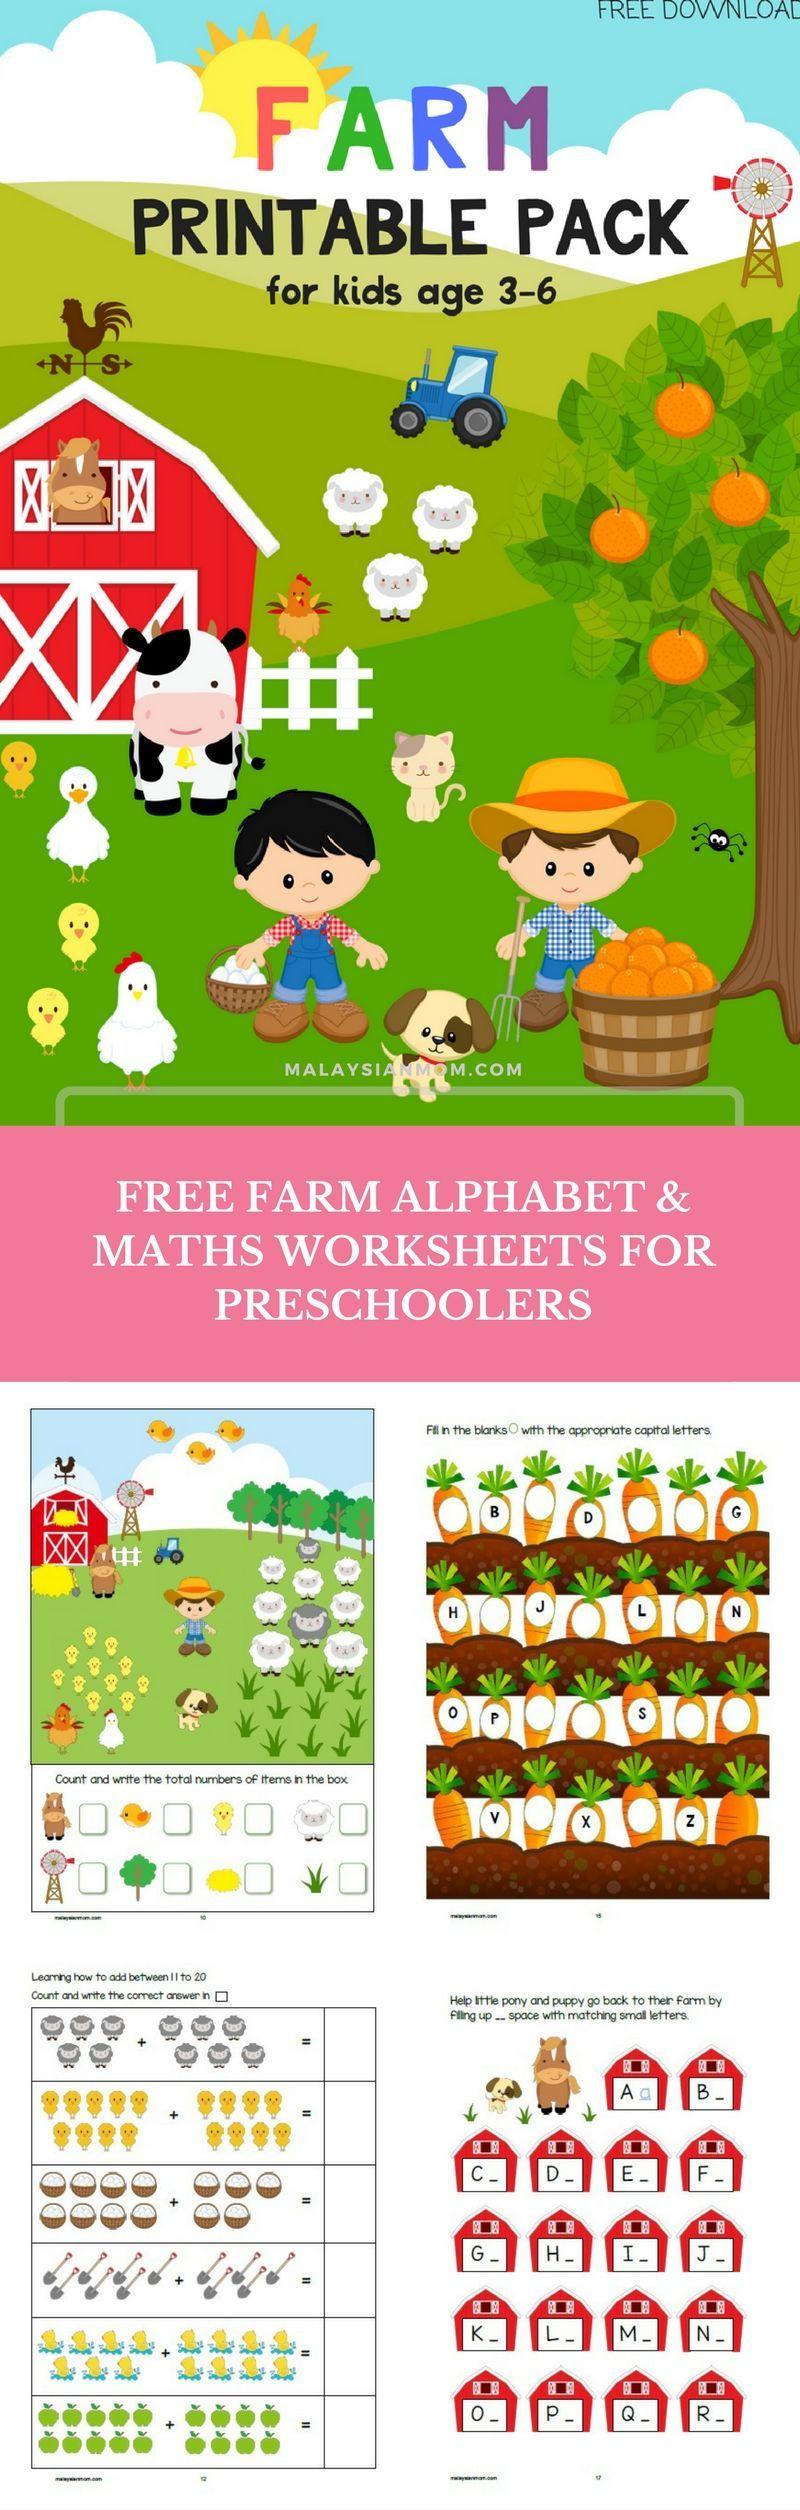 FARM PRINTABLE PACK | Literacy worksheets, Preschool themes and Literacy